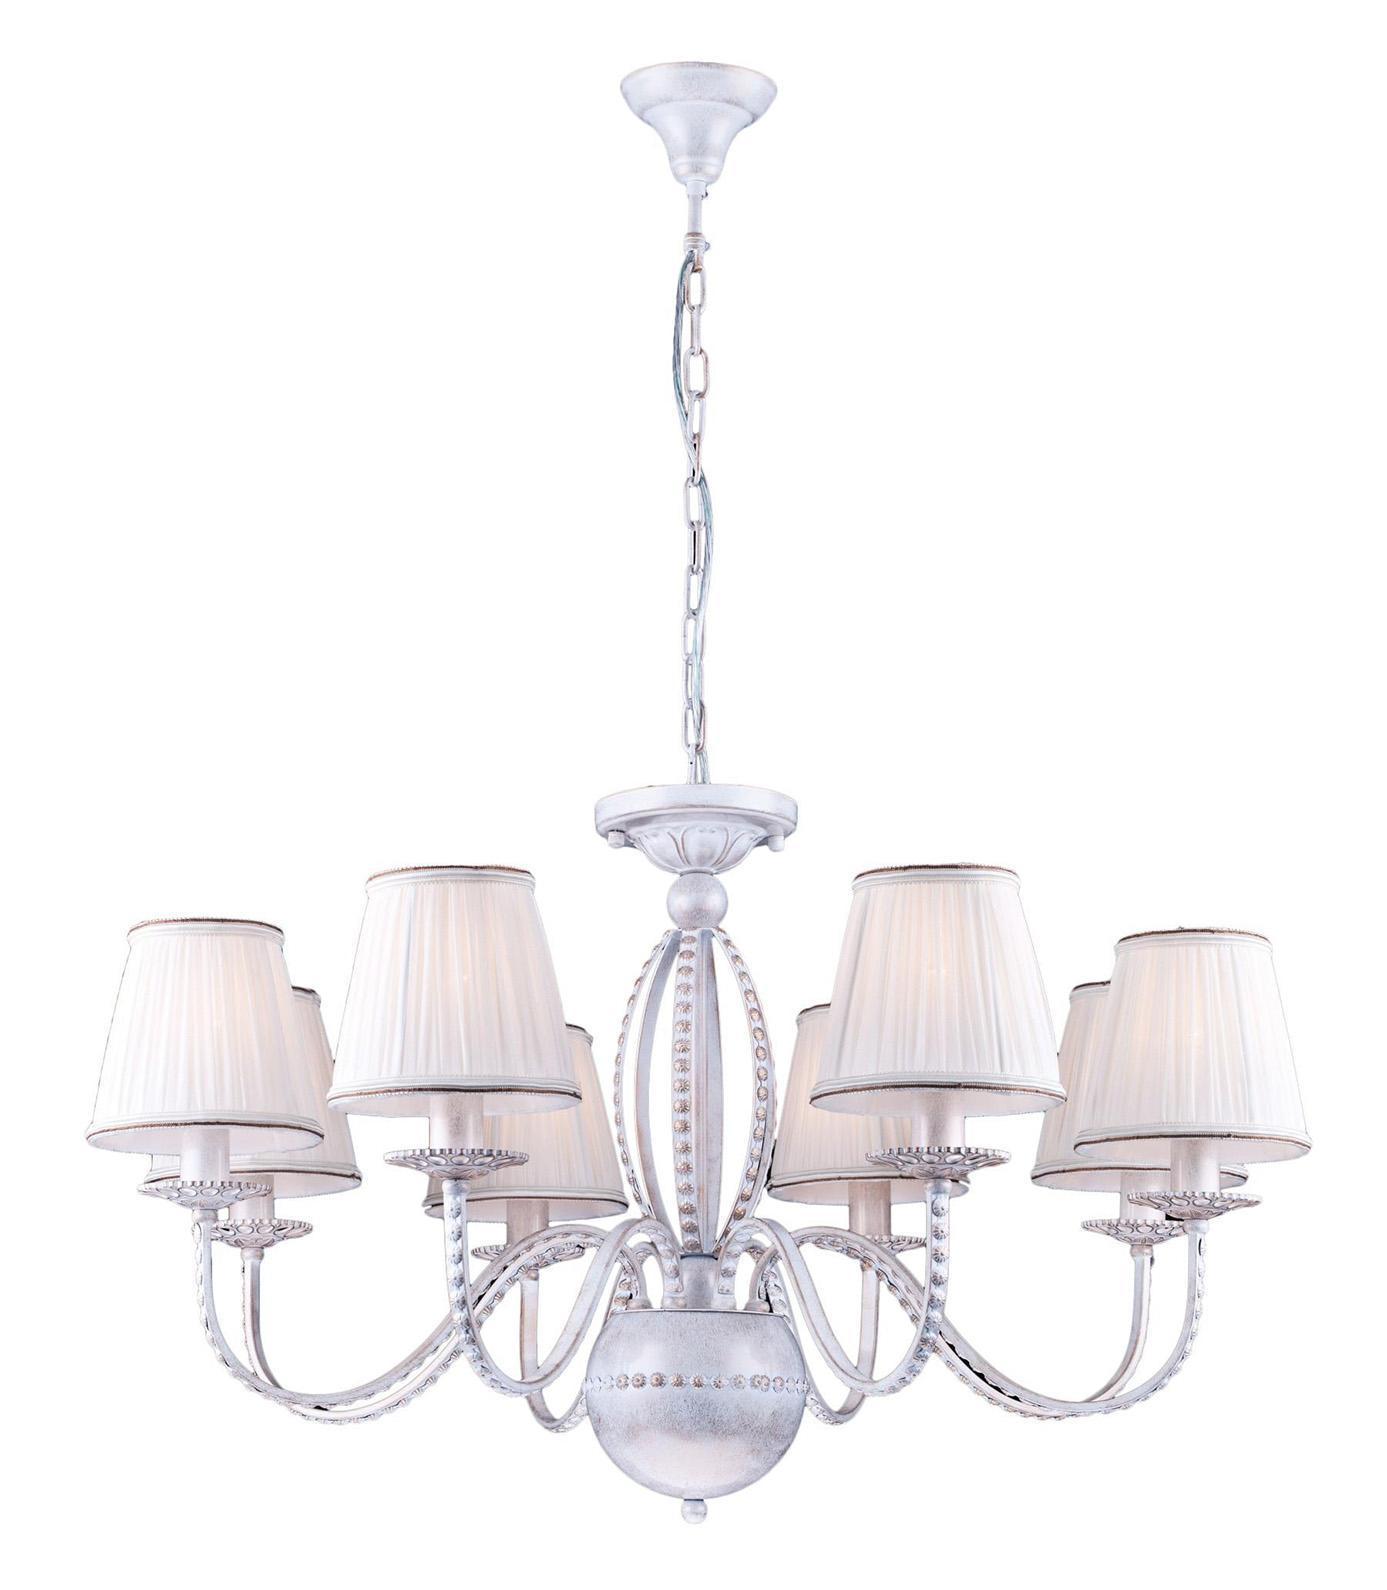 Люстра Arte lamp A2046lm-8wg